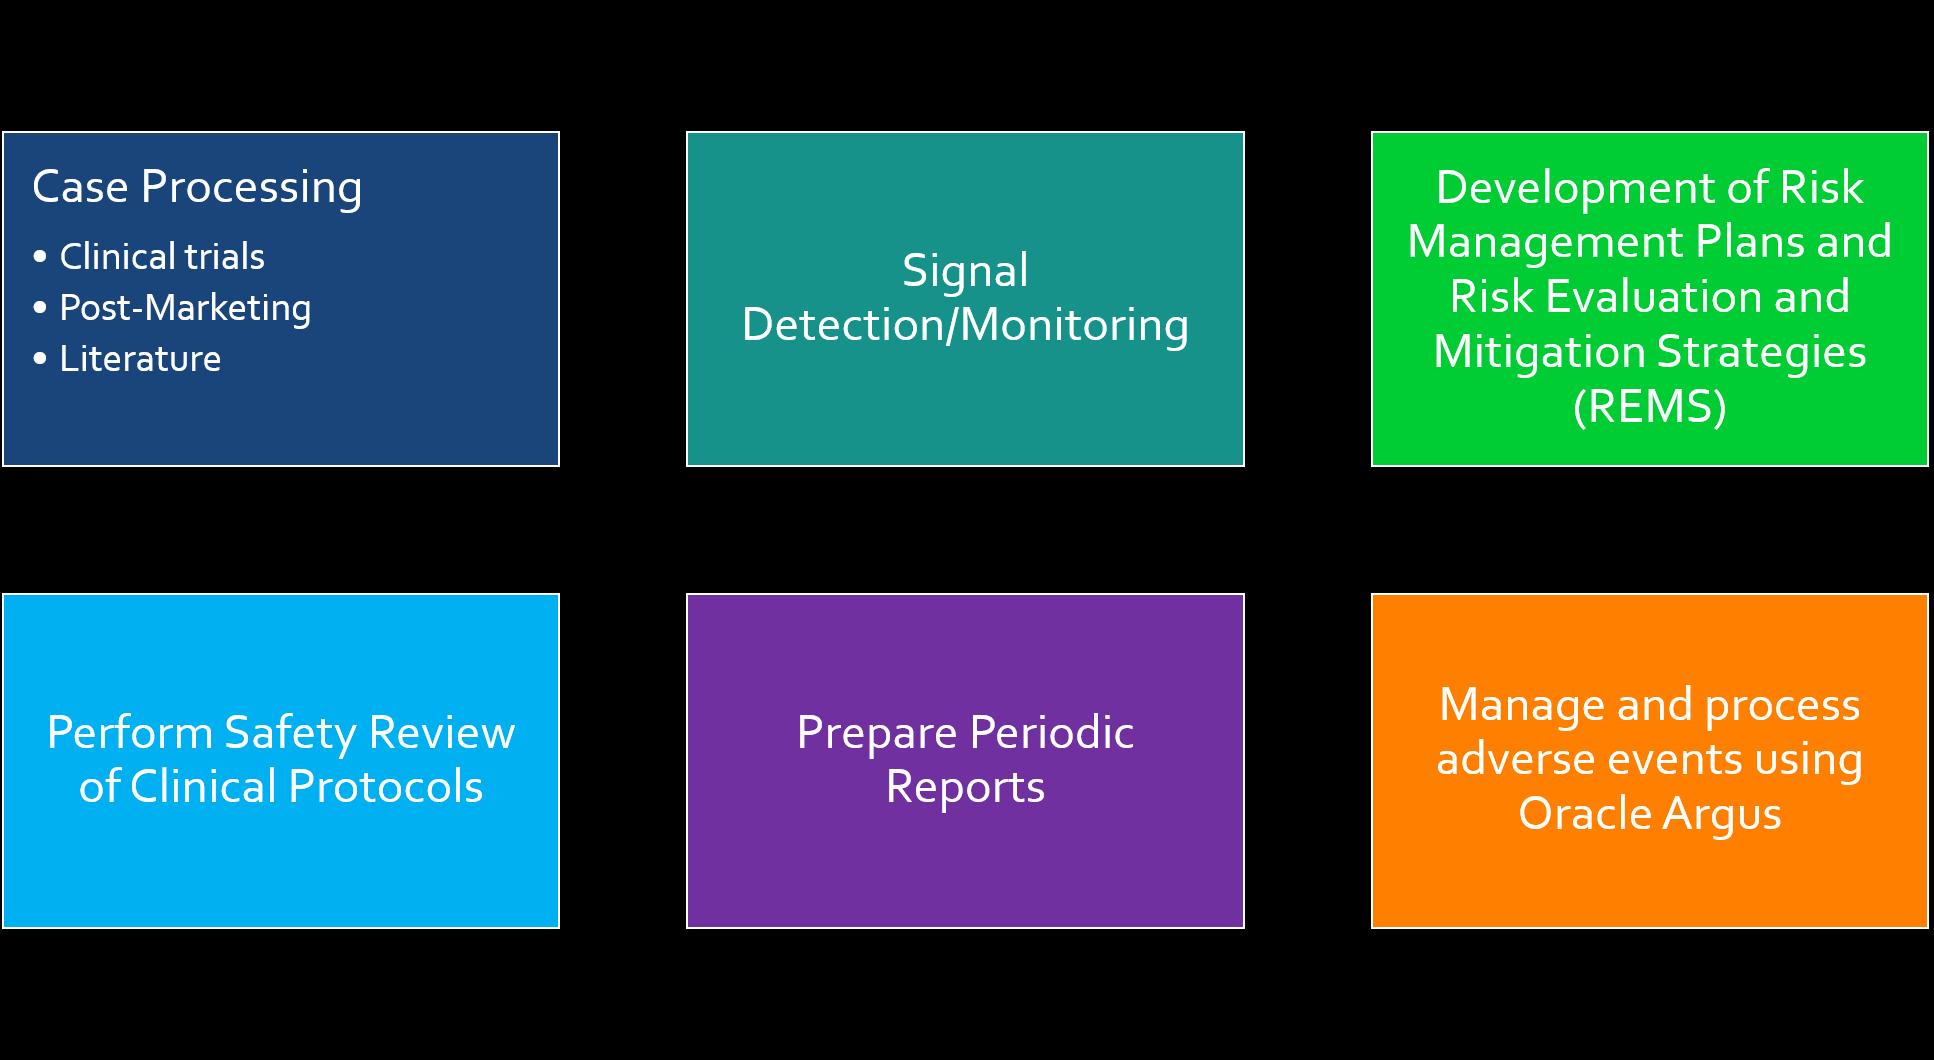 Drug Safety Process